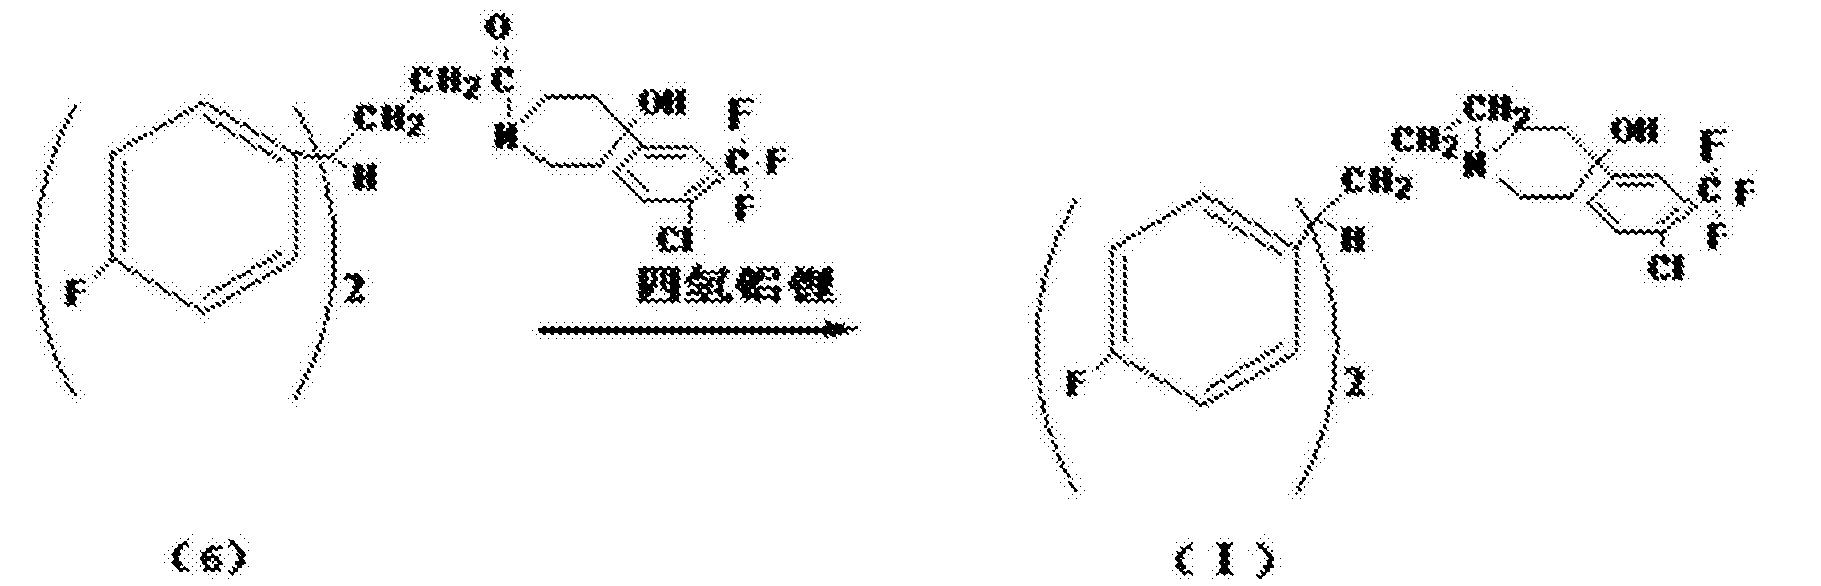 Figure CN106187863AD00221